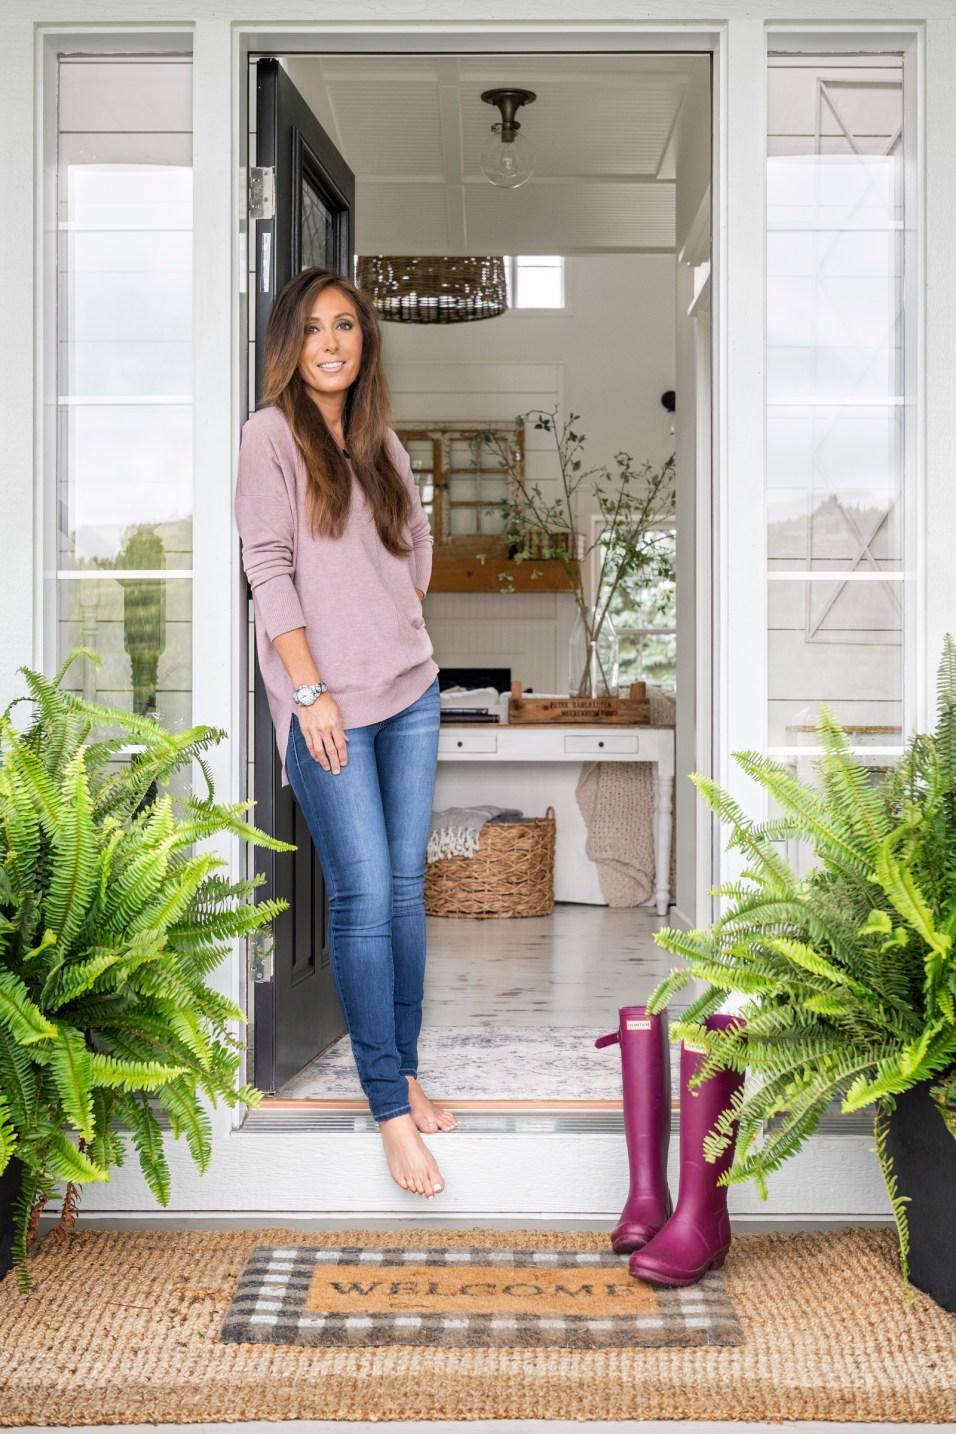 Sarah Martin, lead interior designer at beautiful chaos